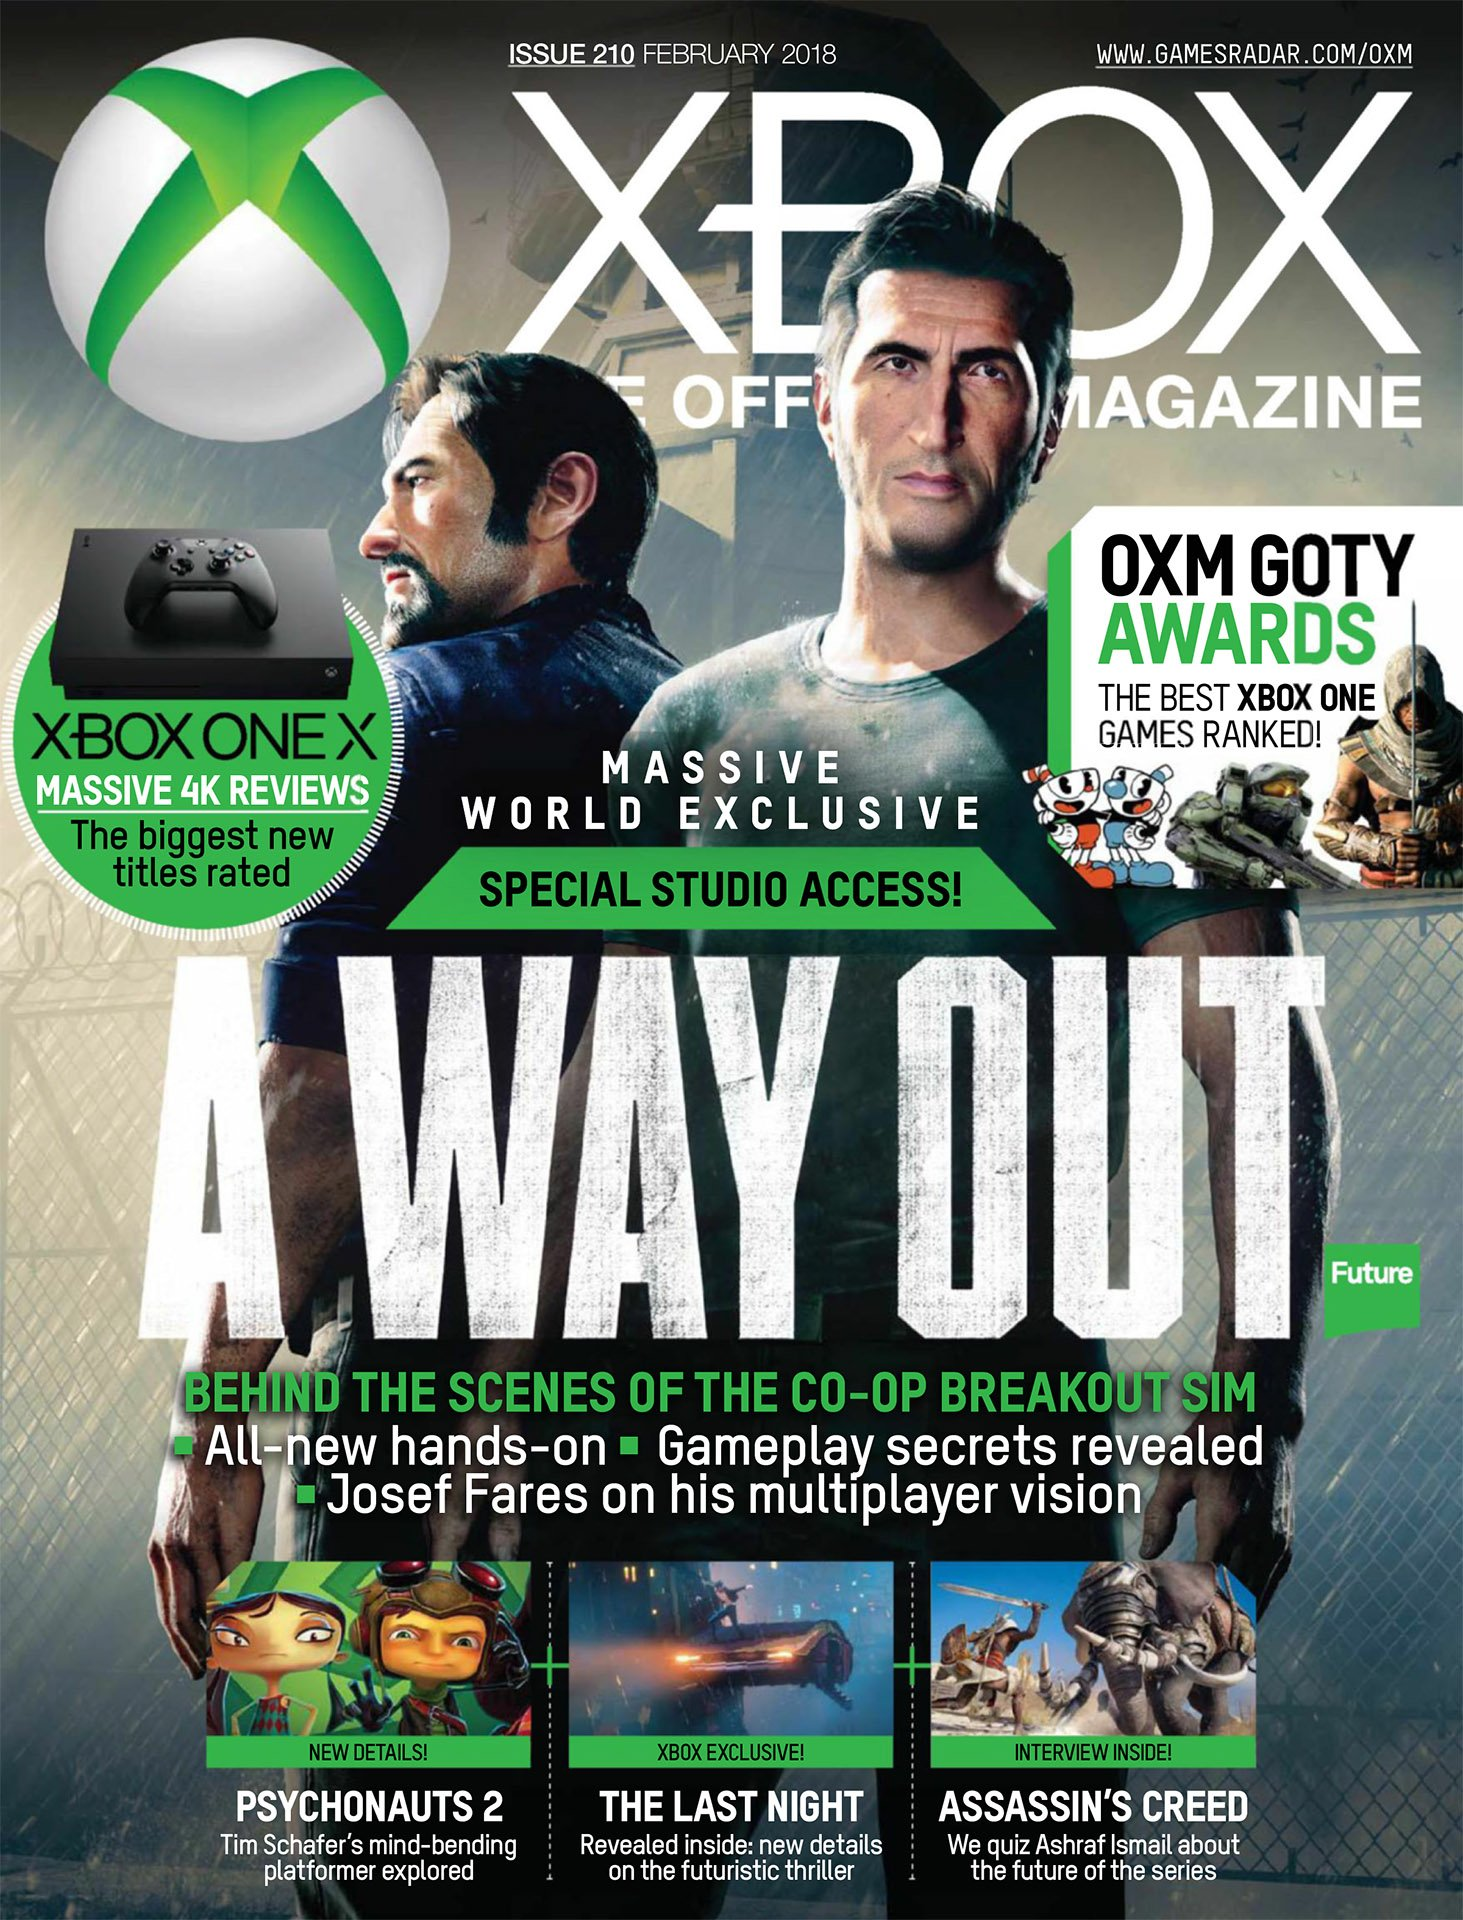 Official Xbox Magazine 210 (February 2018)